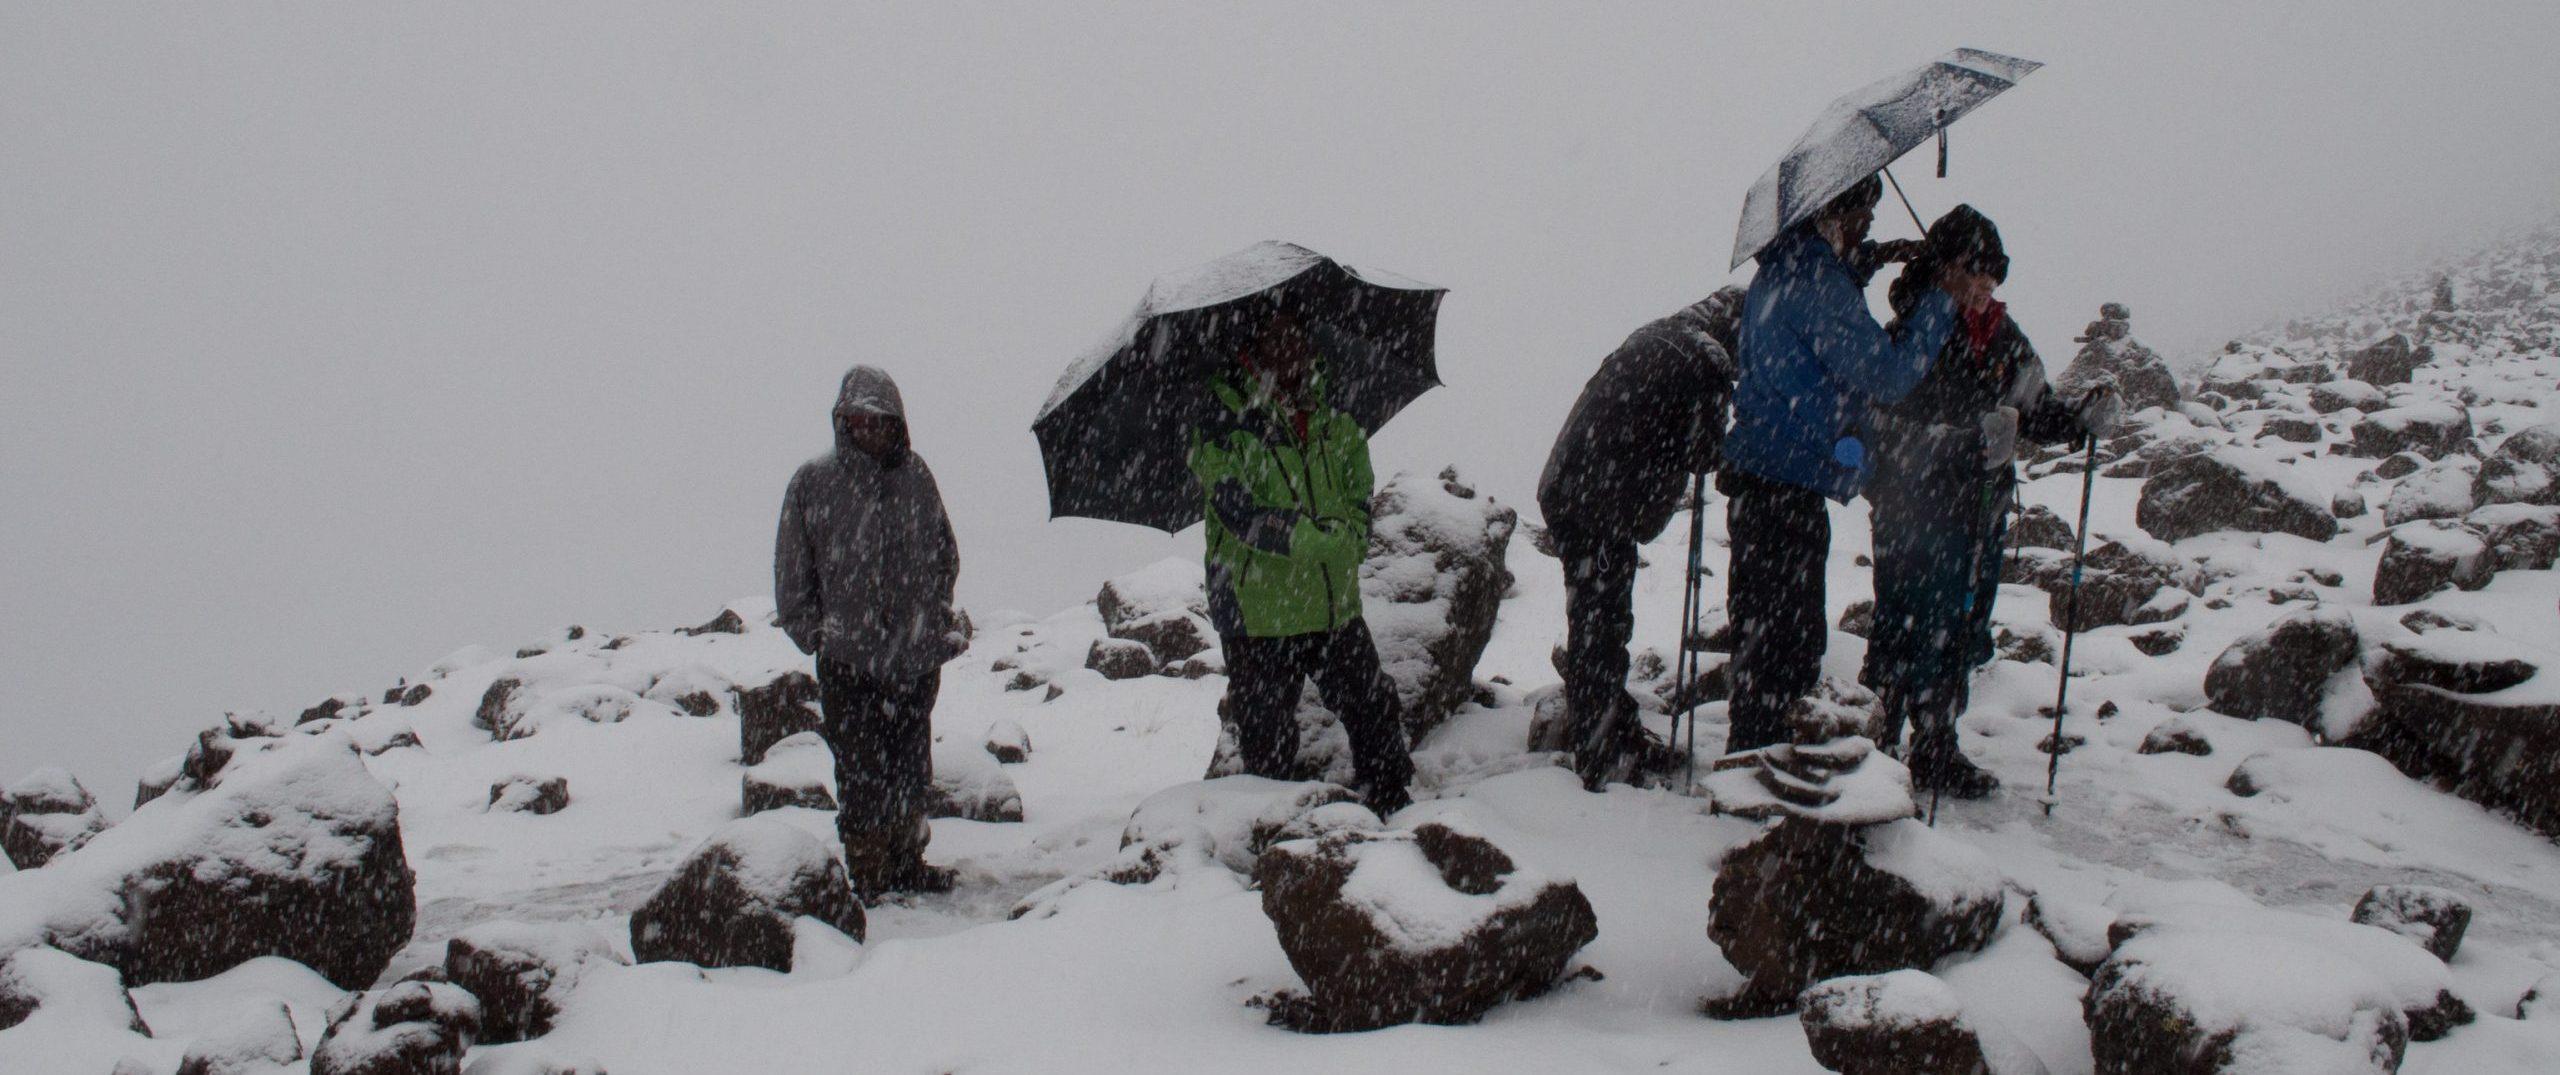 Kilimanjaro weather raining -Best time to climb kilimanjaro